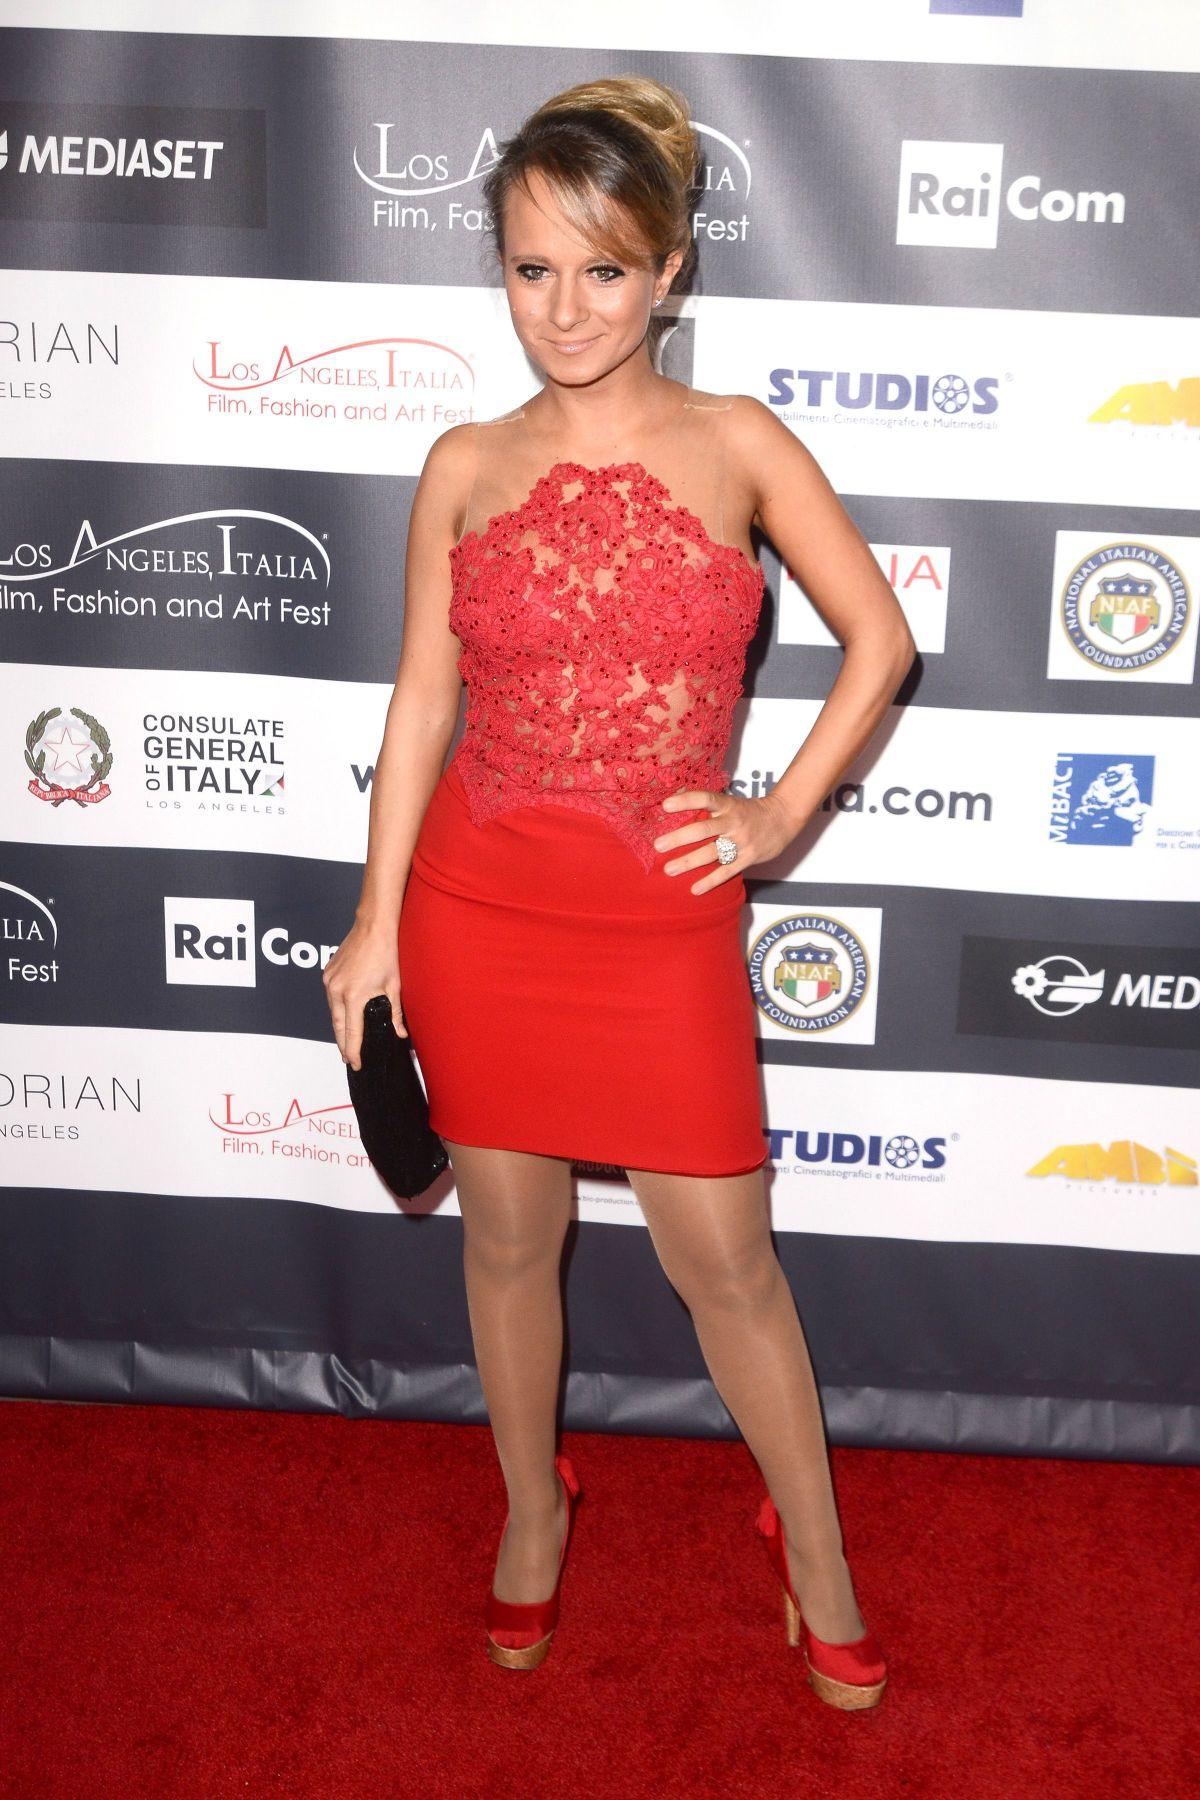 MARIA ELENA INFANTINO at 12th Los Angeles Italia Film, Fashion and Art Festival 02/19/2017